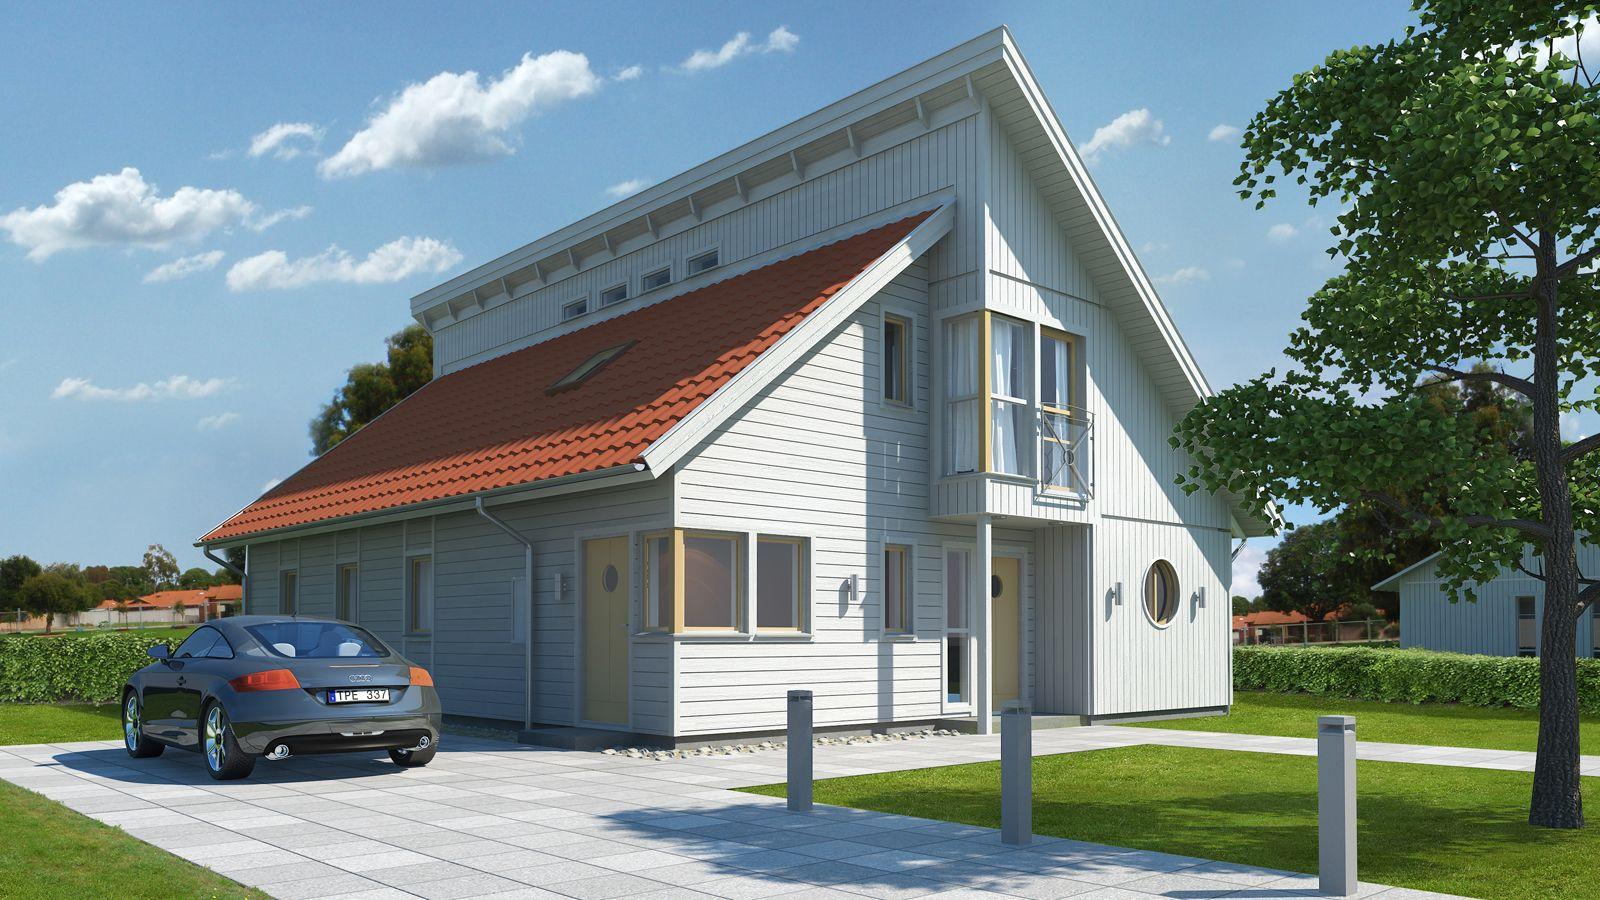 Salto | Self Build Kit Home from Sweden | scandinavian home | Pinterest